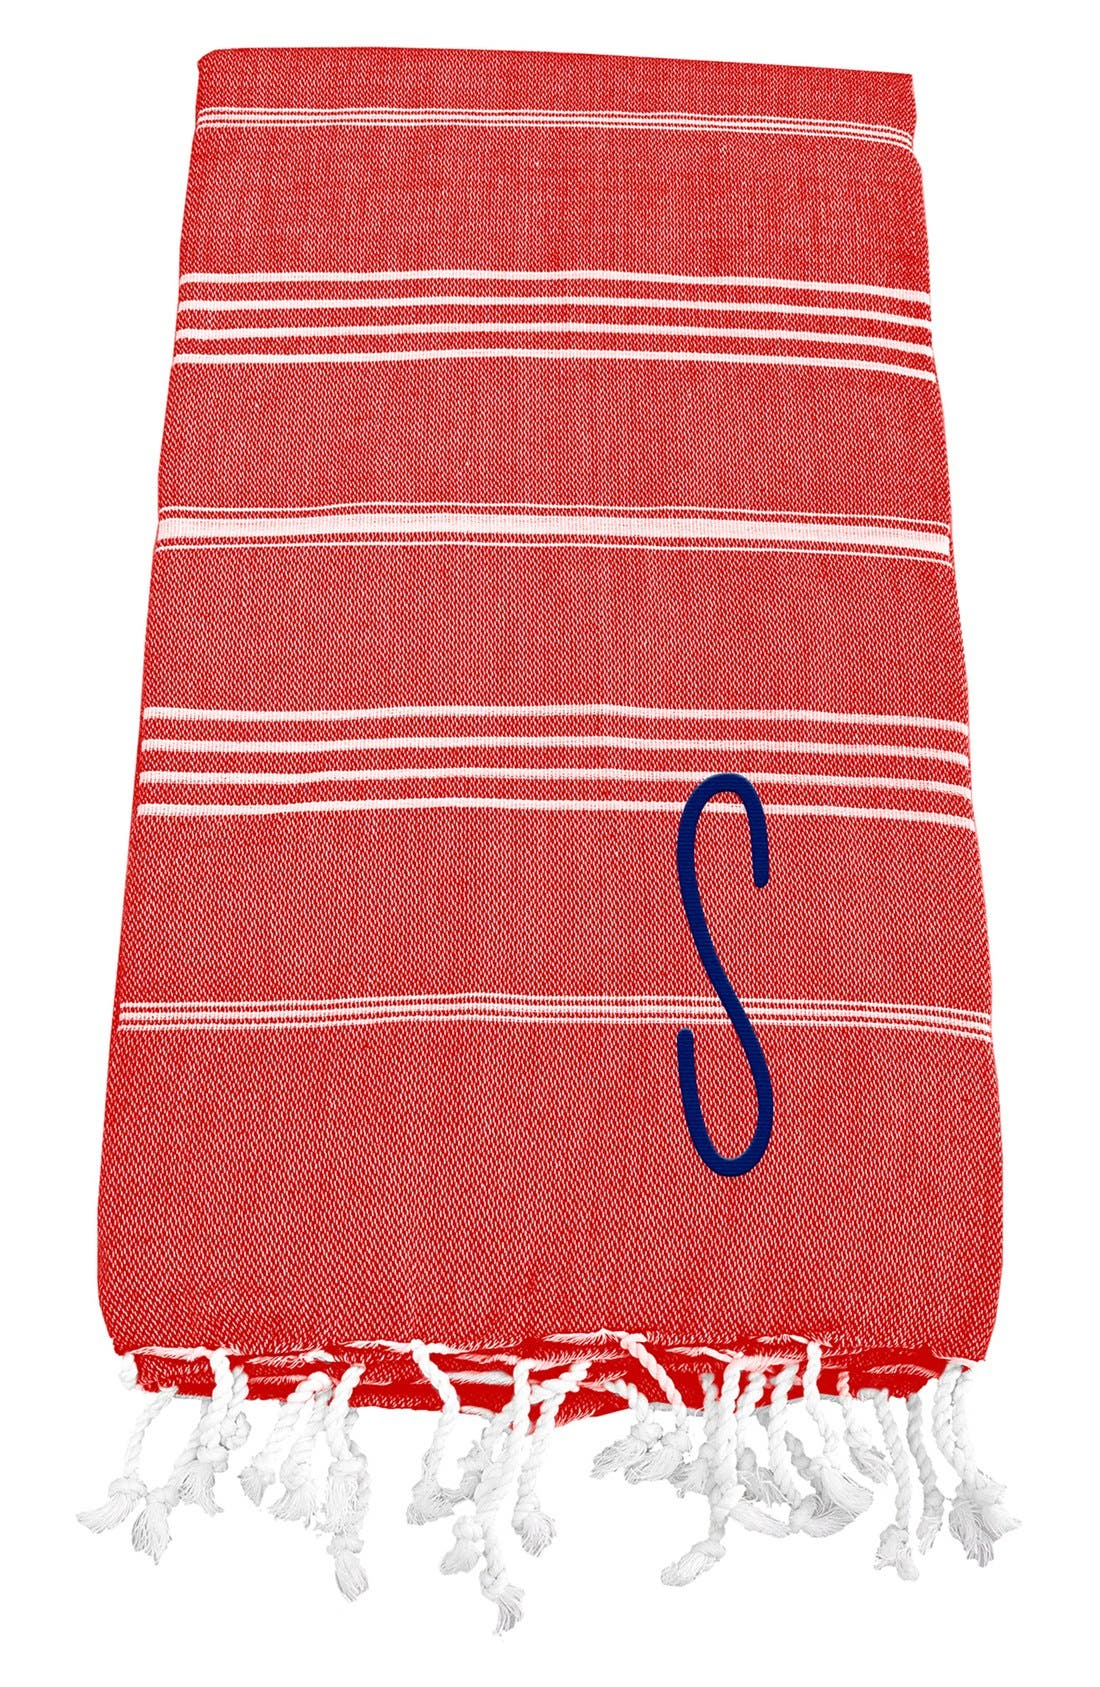 Monogram Turkish Cotton Towel,                             Main thumbnail 128, color,